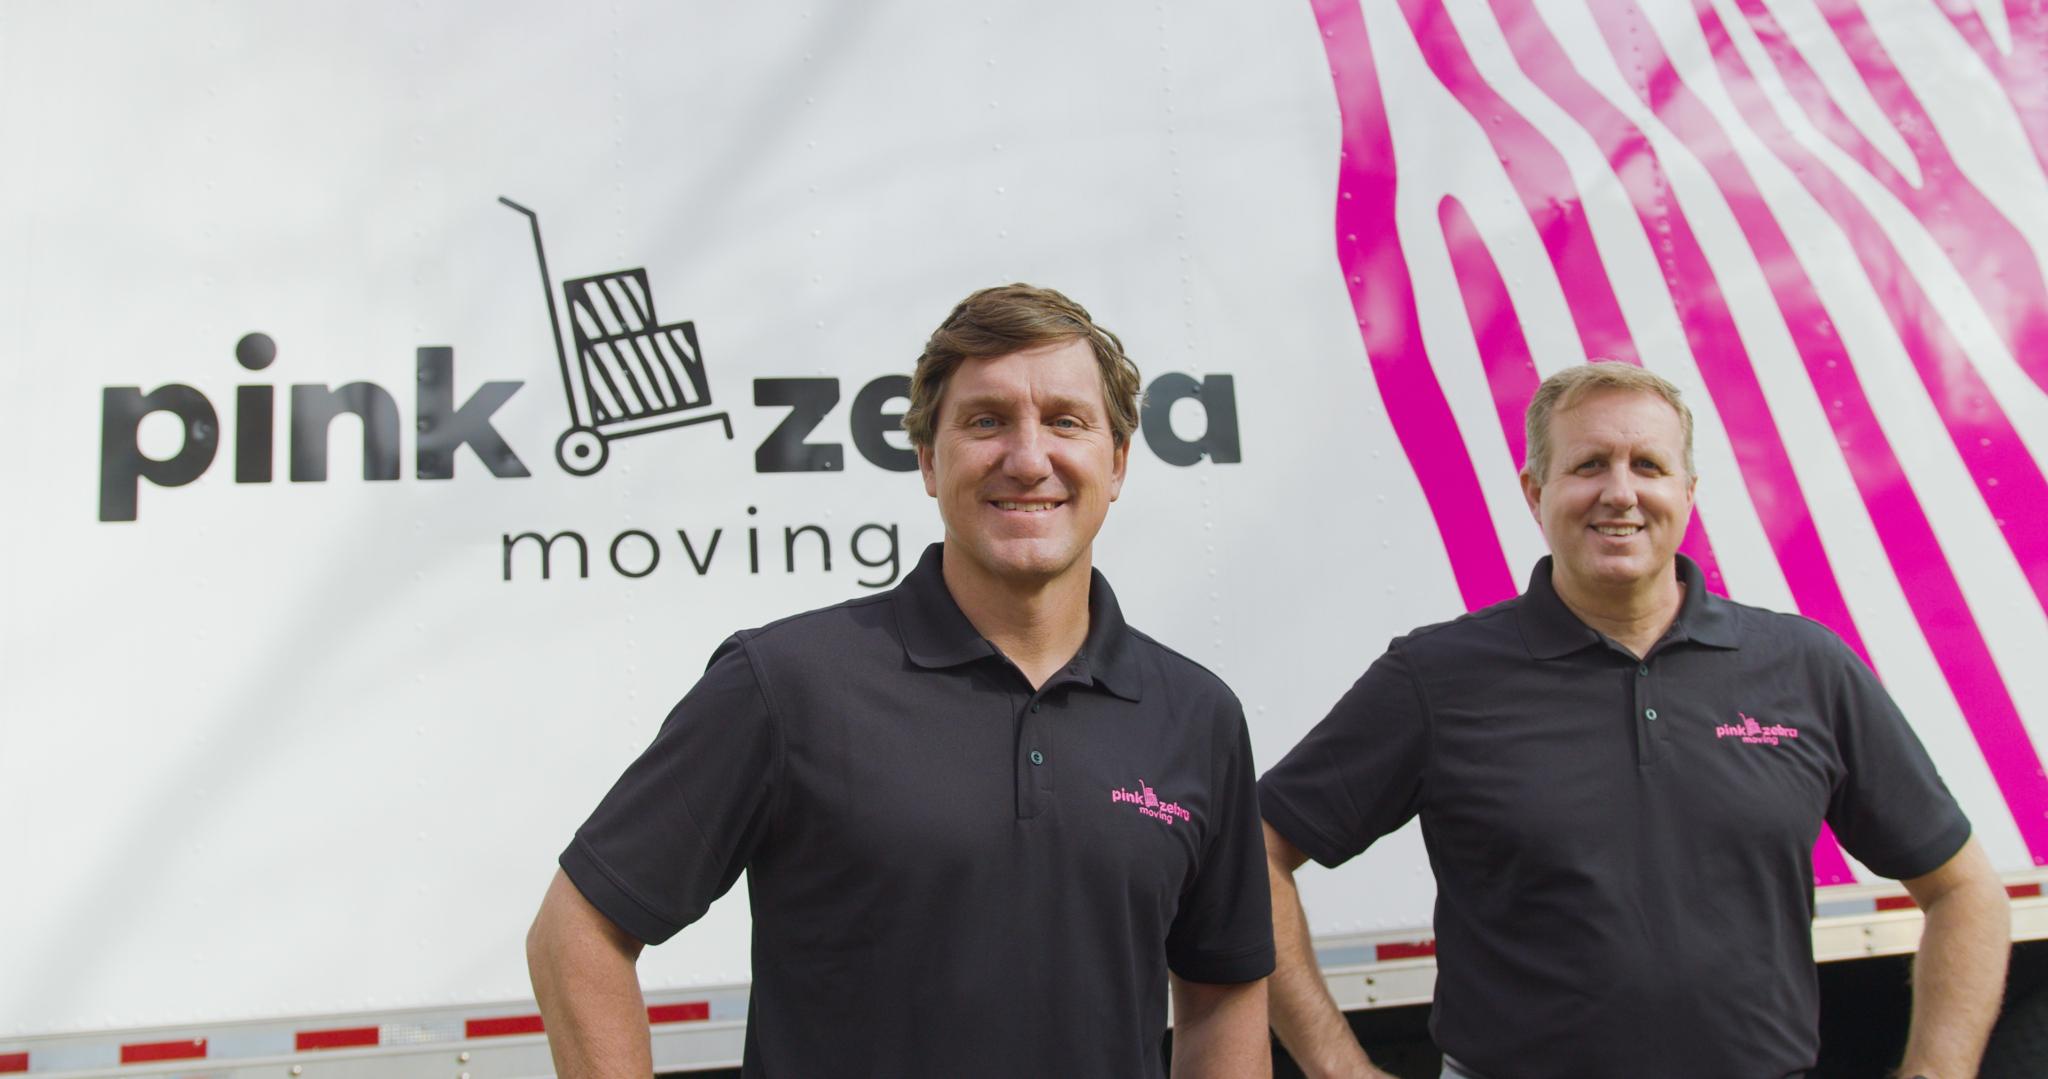 Local entrepreneur starts new venture, Pink Zebra Moving